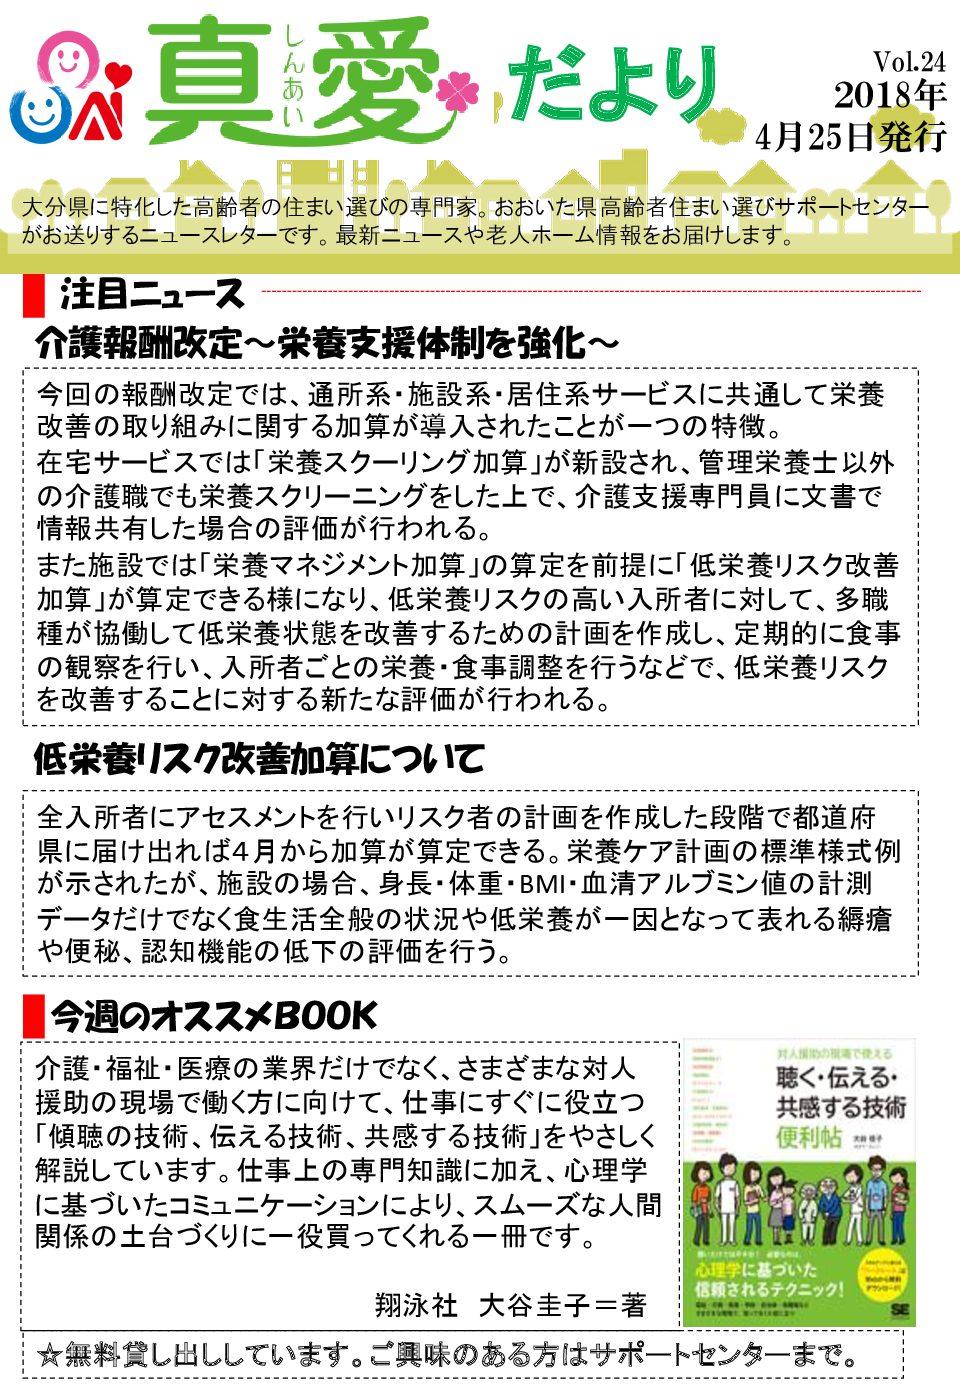 【Vol.24】 2018.04.25発行